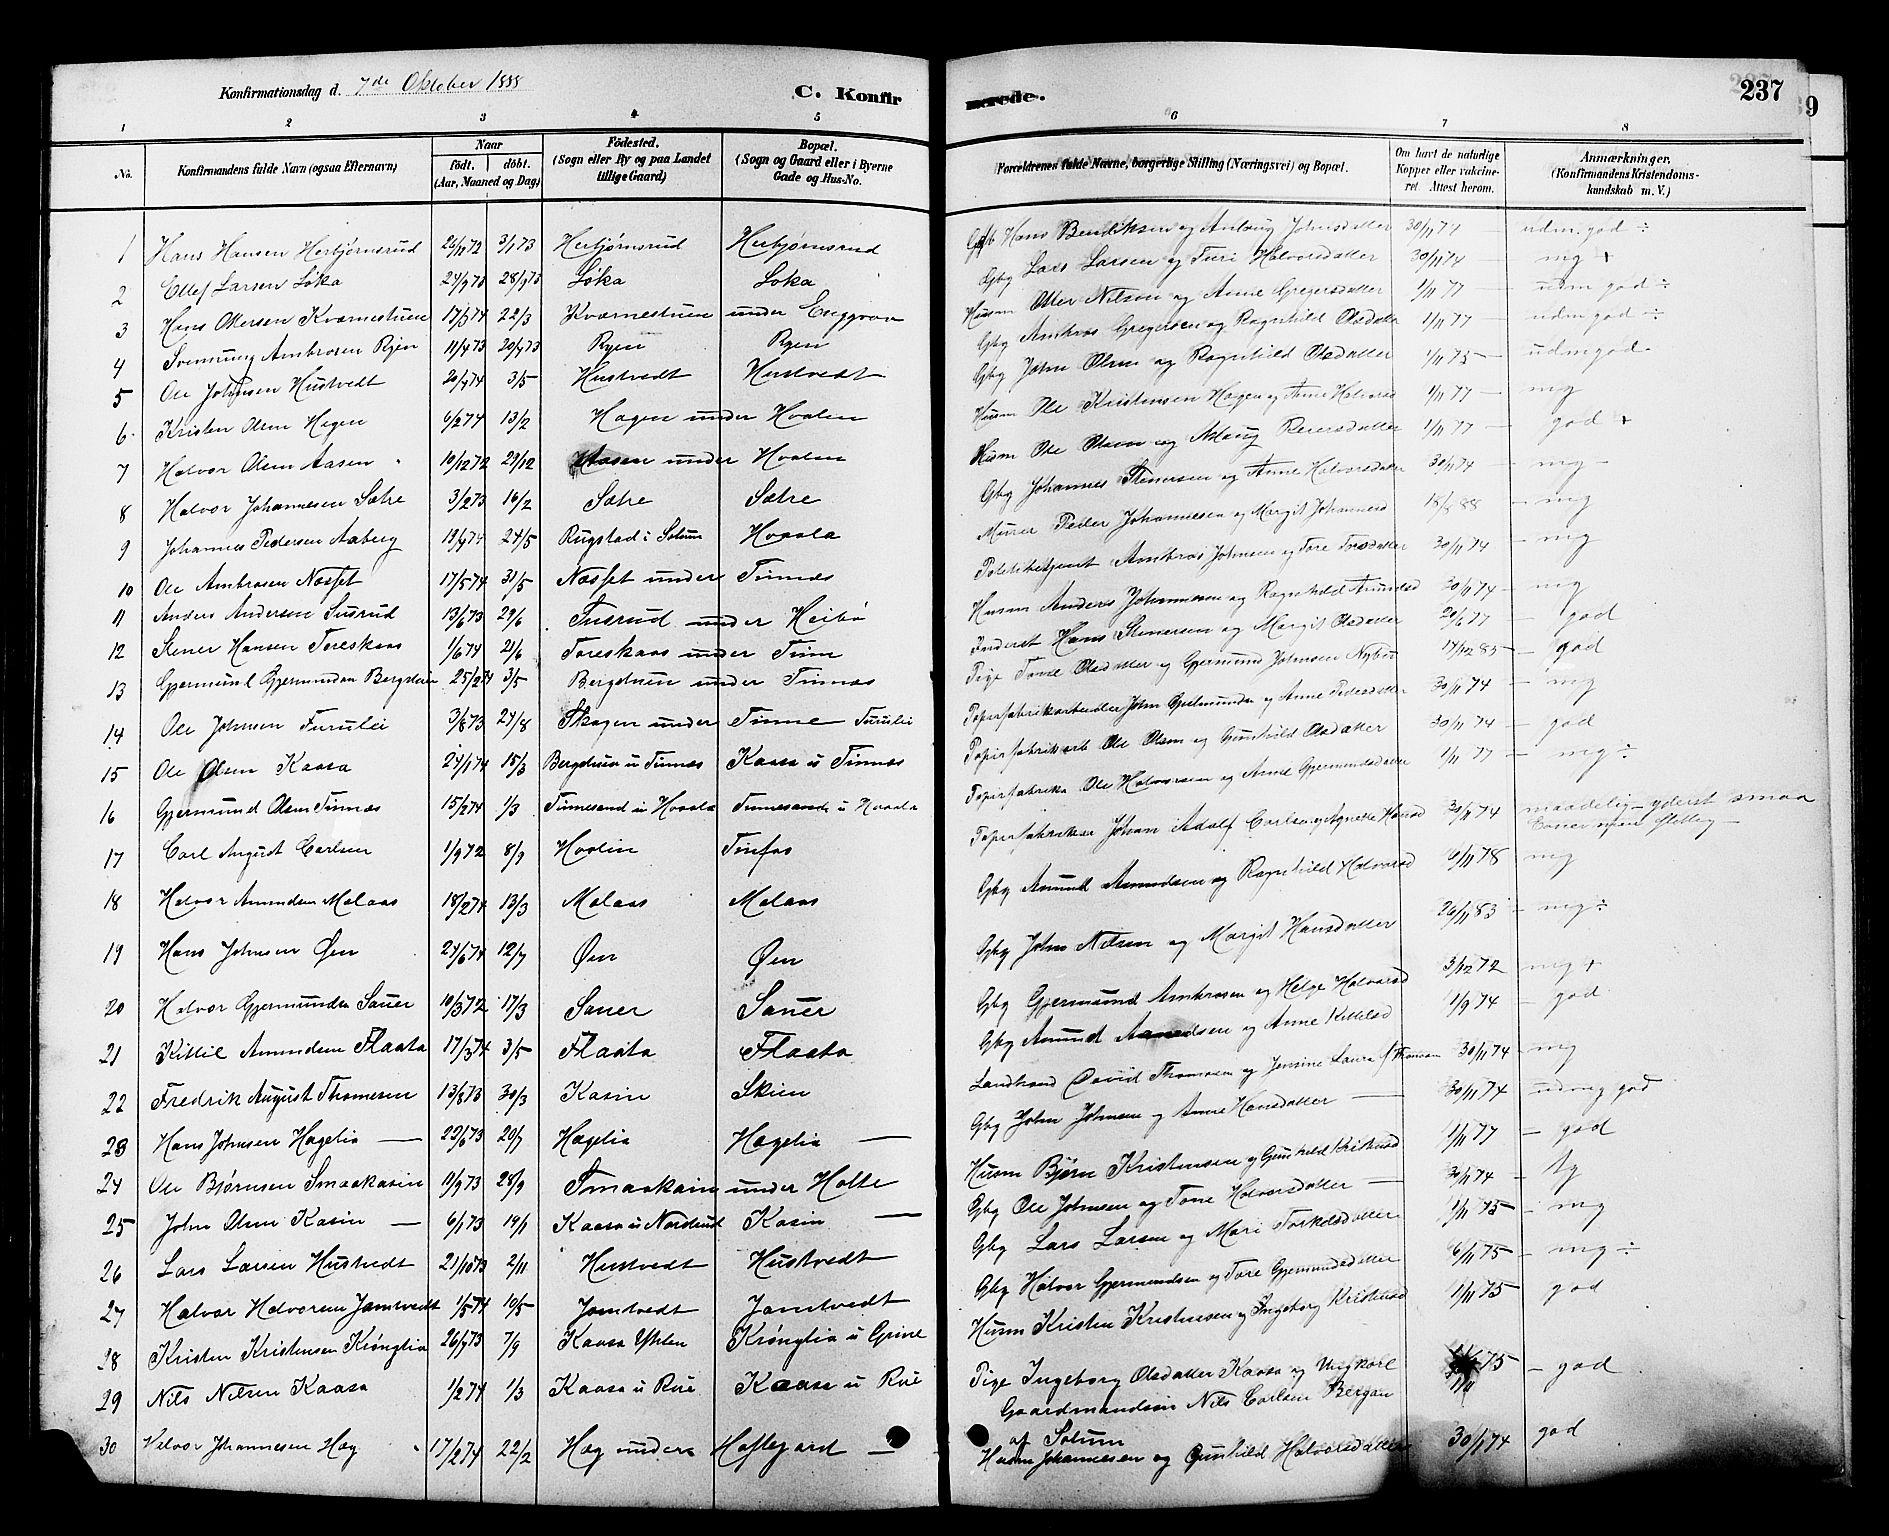 SAKO, Heddal kirkebøker, G/Ga/L0002: Klokkerbok nr. I 2, 1879-1908, s. 237